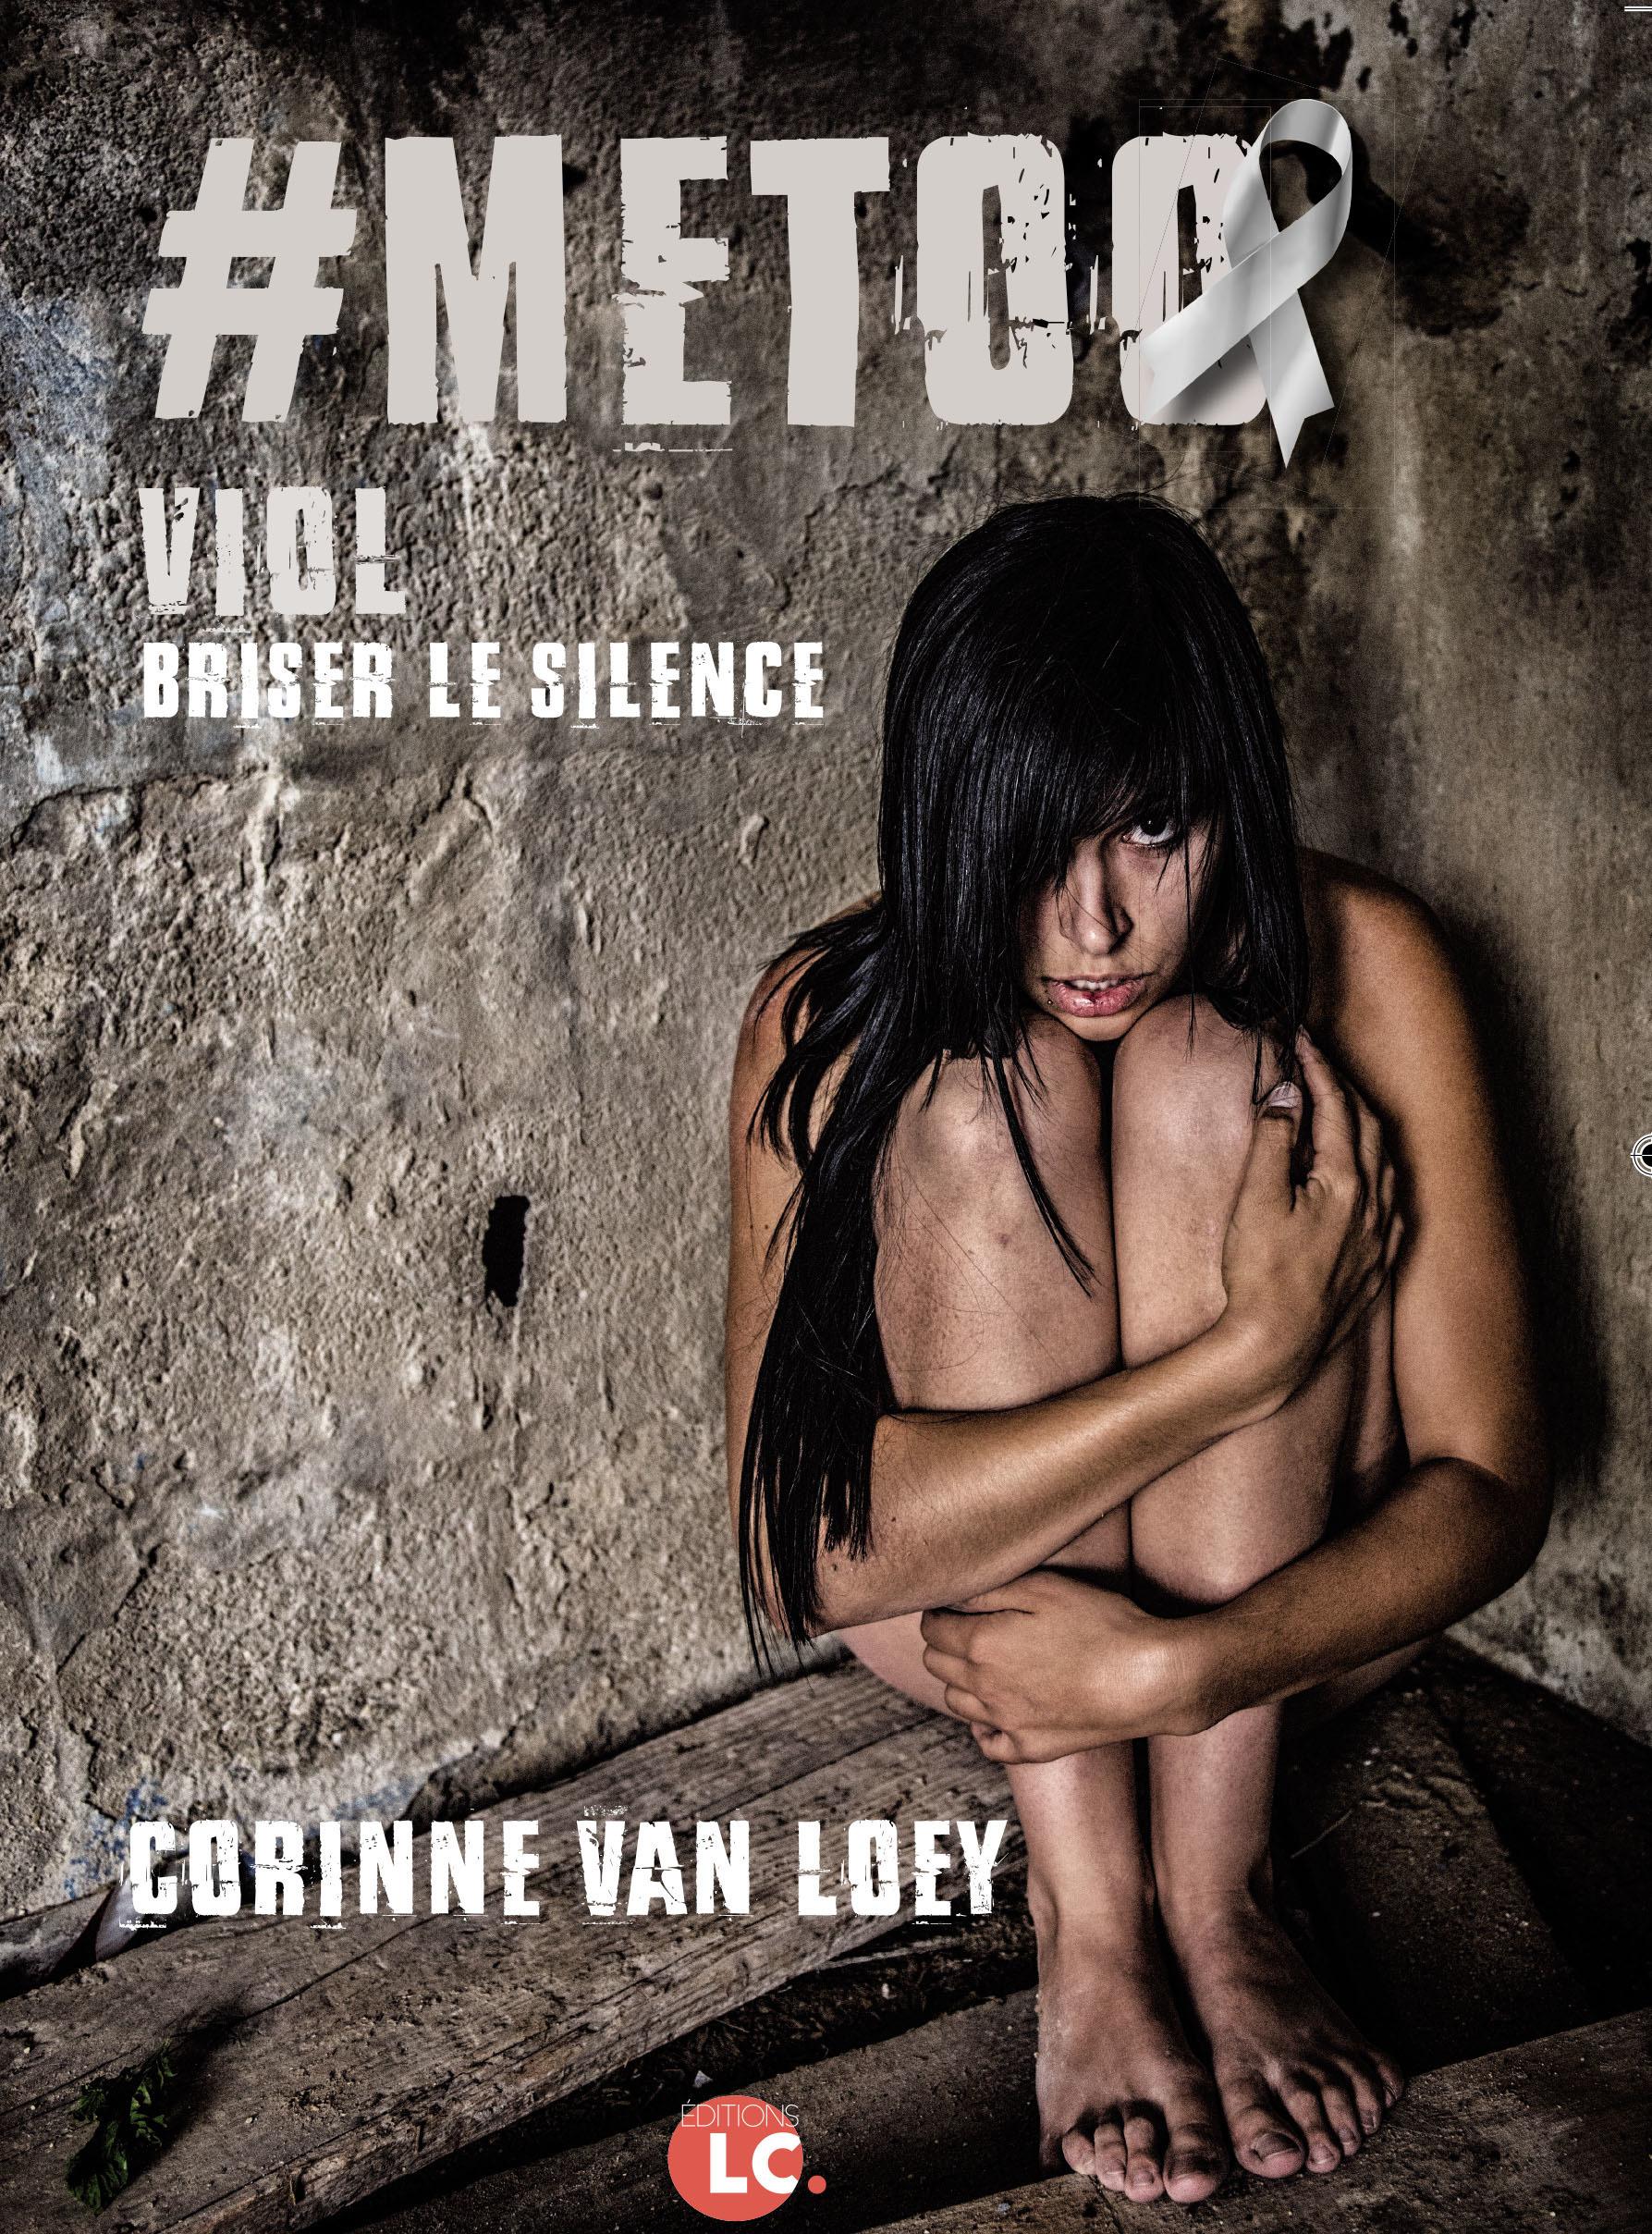 #metoo viol  briser le silence